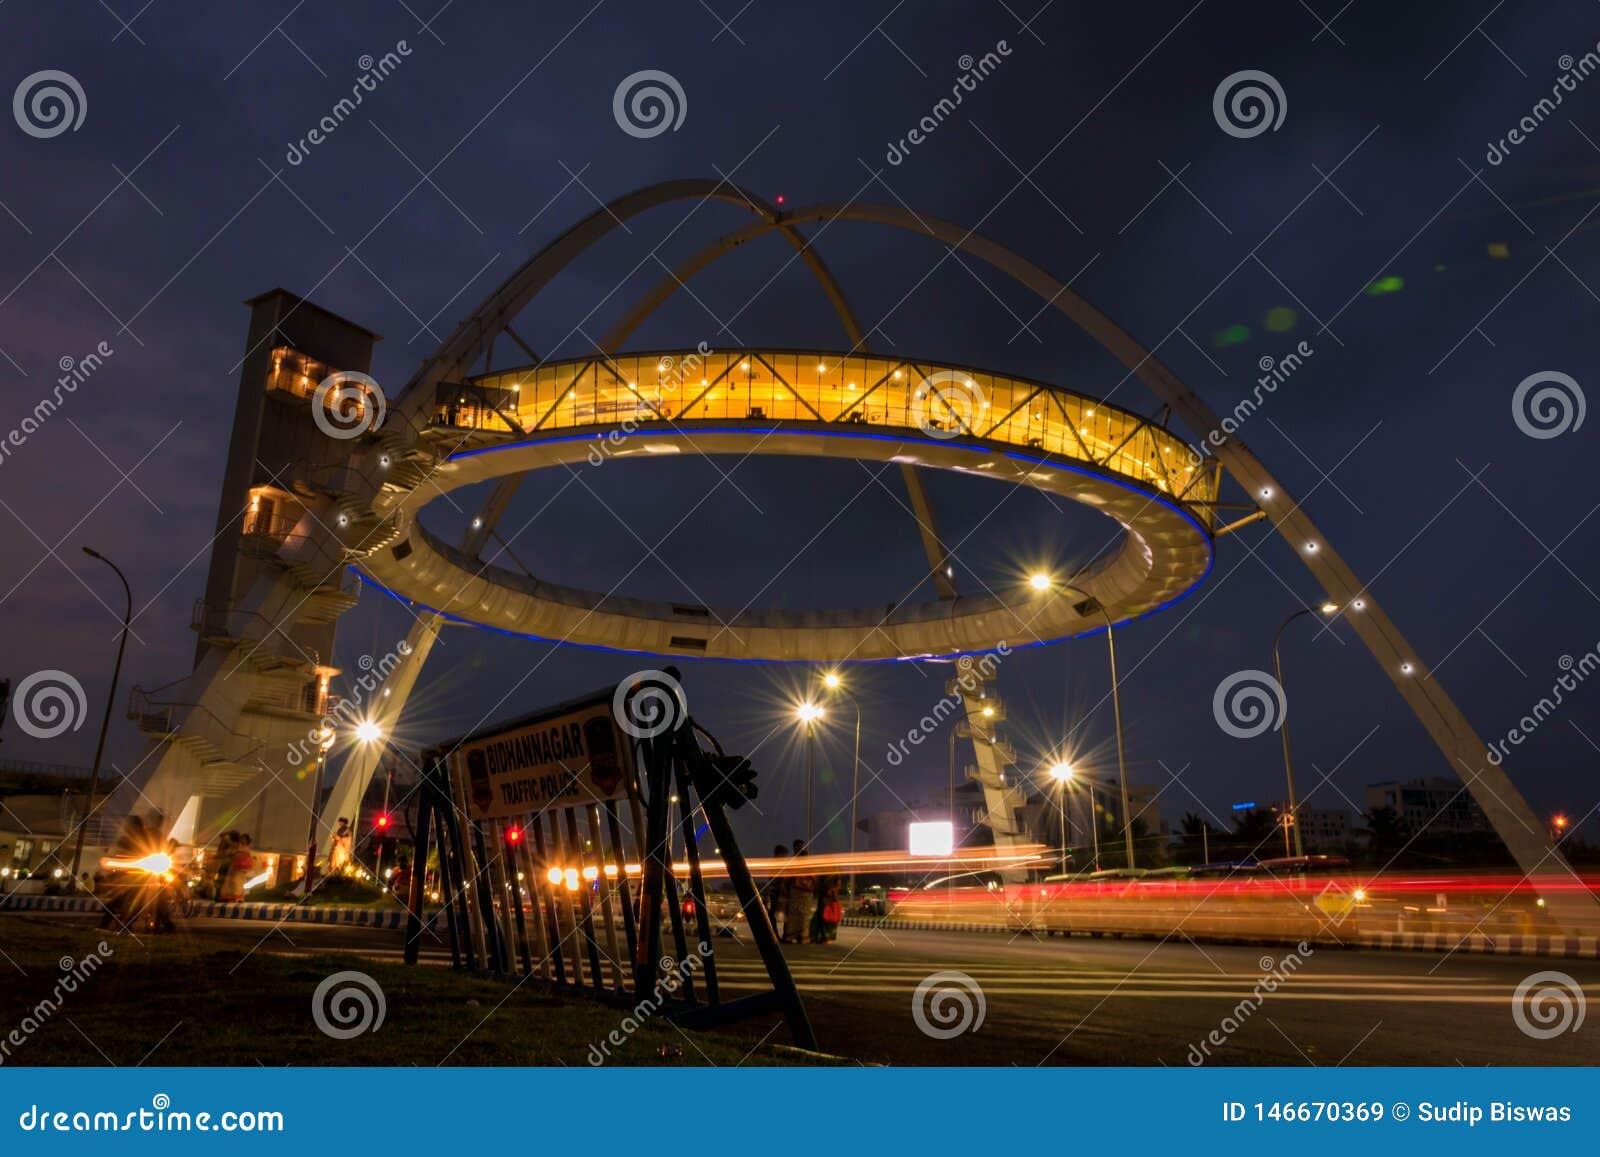 Biswa bangla gate